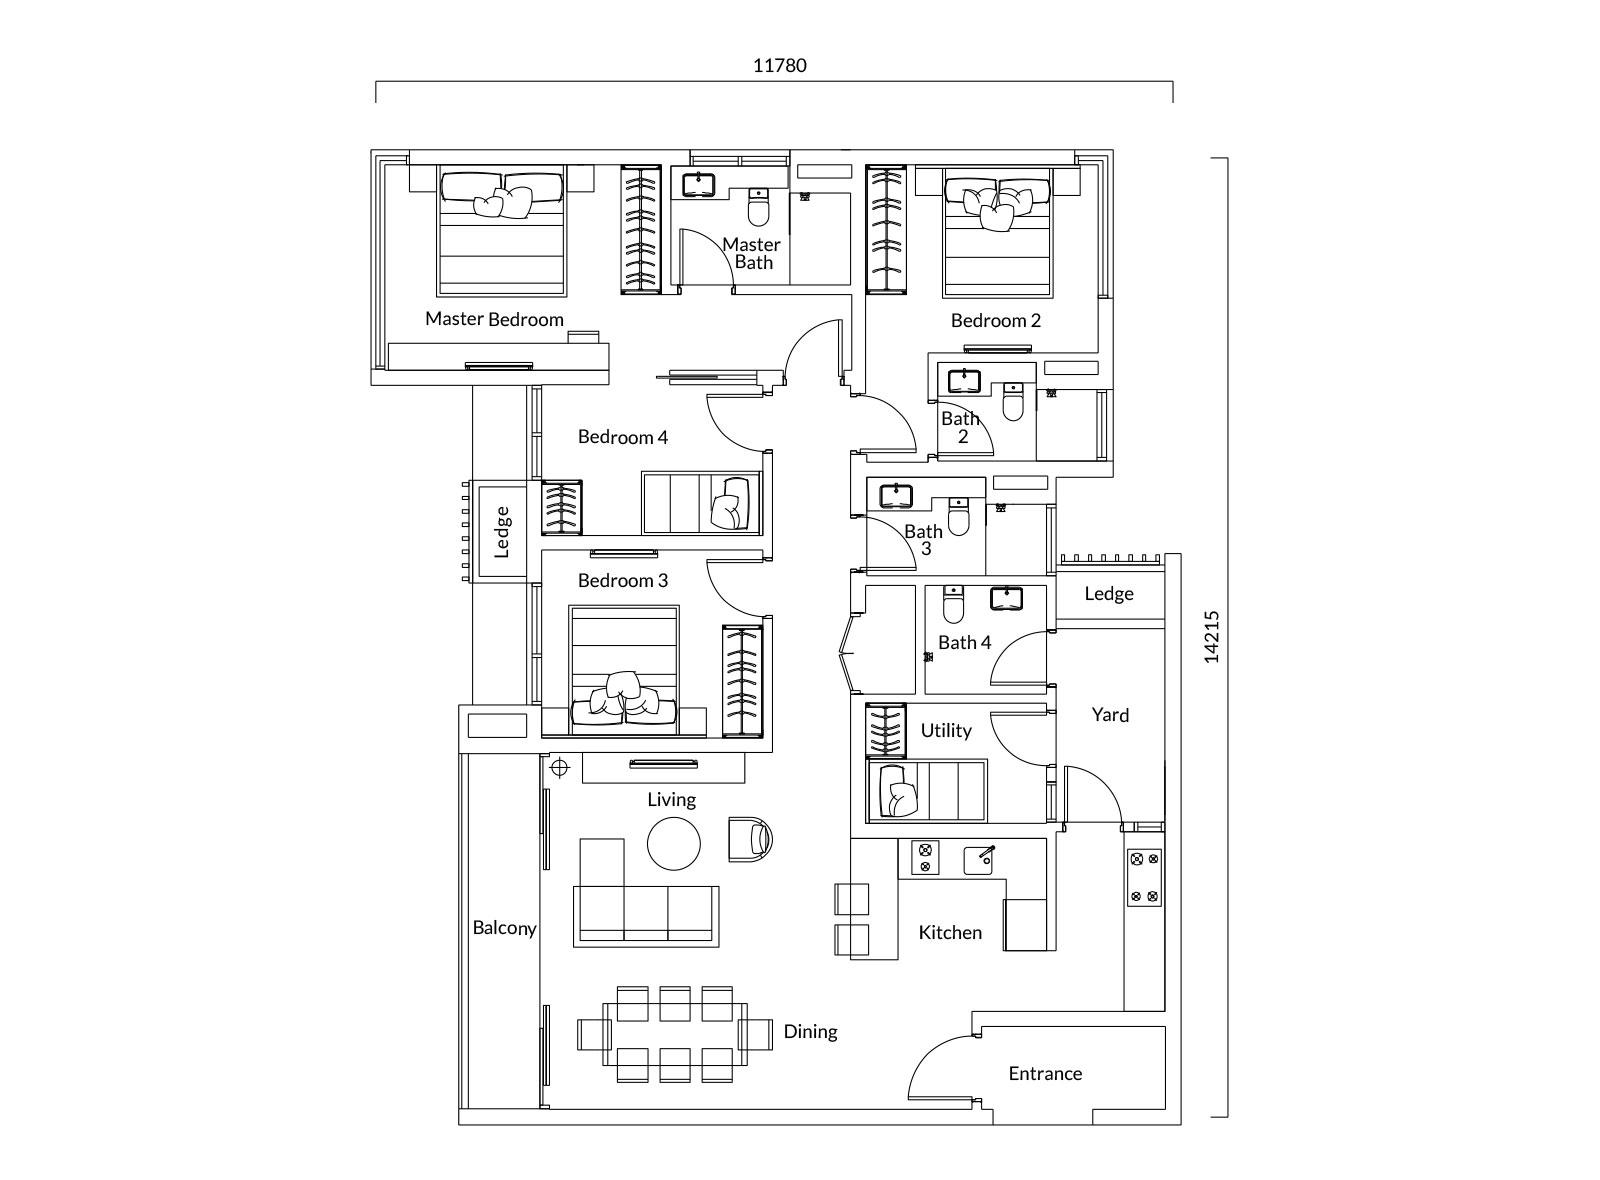 Serini Melawati Sime Darby Property